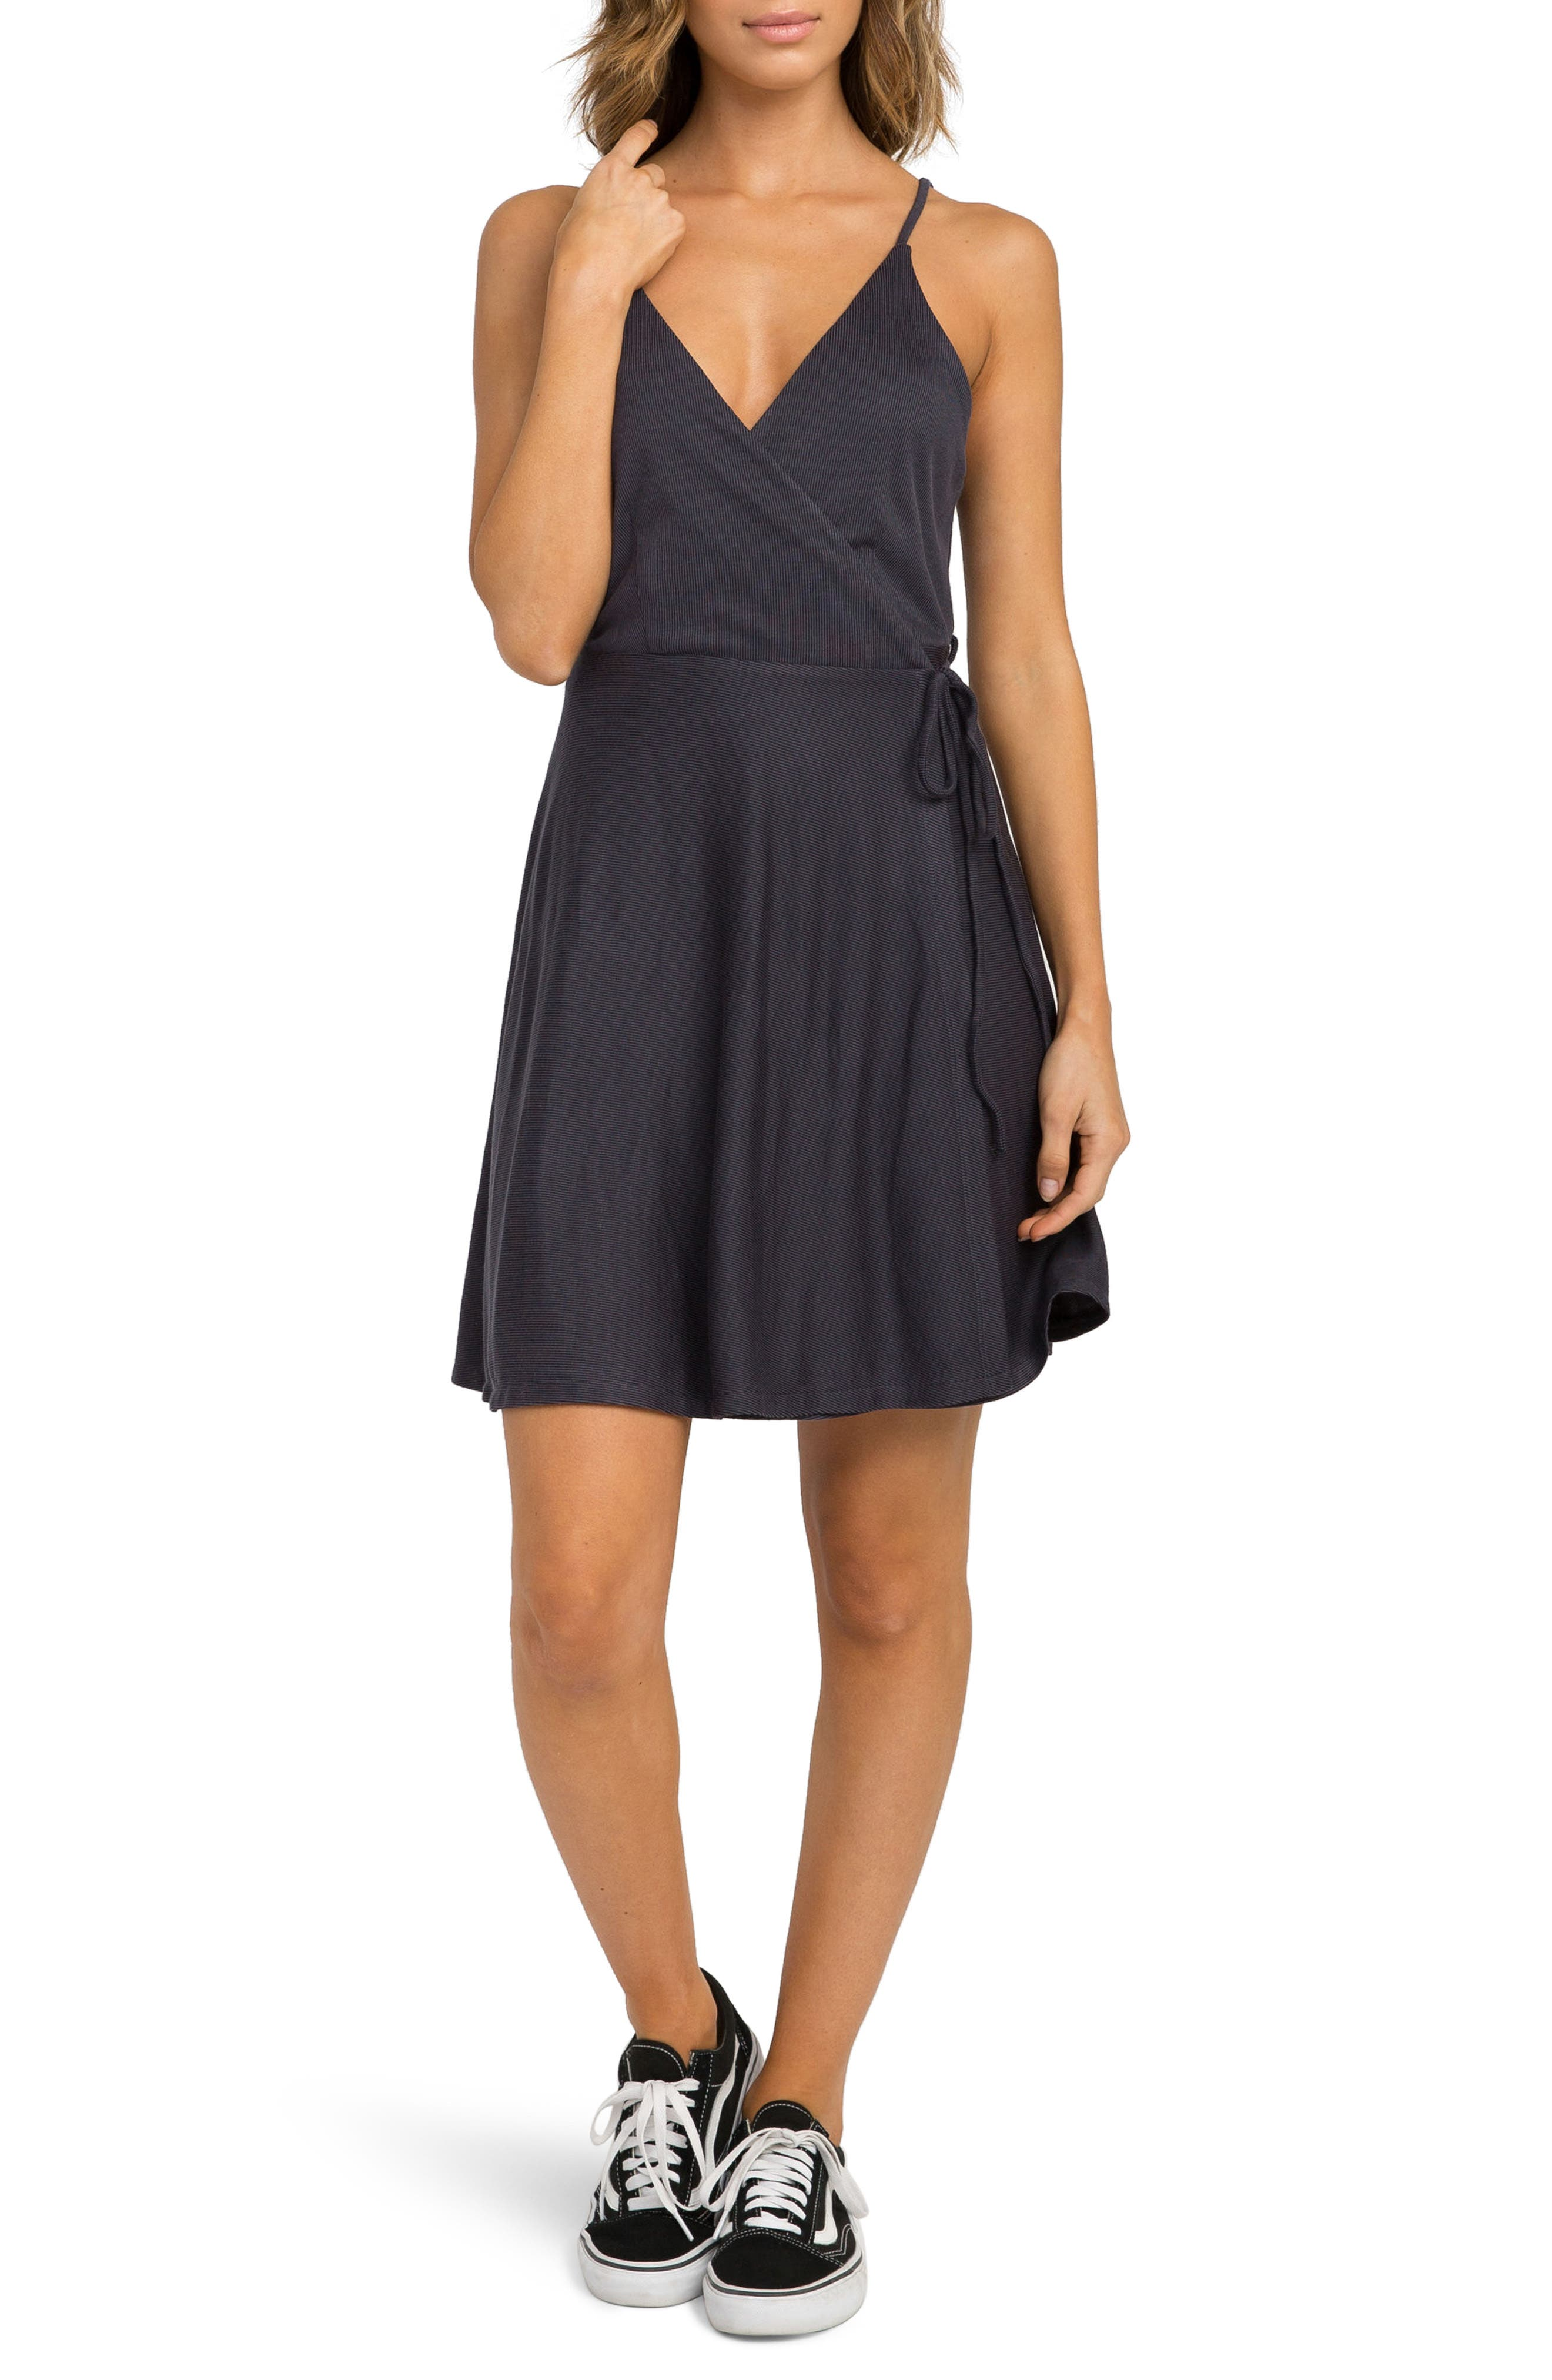 Kelso Wrap Dress,                             Main thumbnail 1, color,                             001